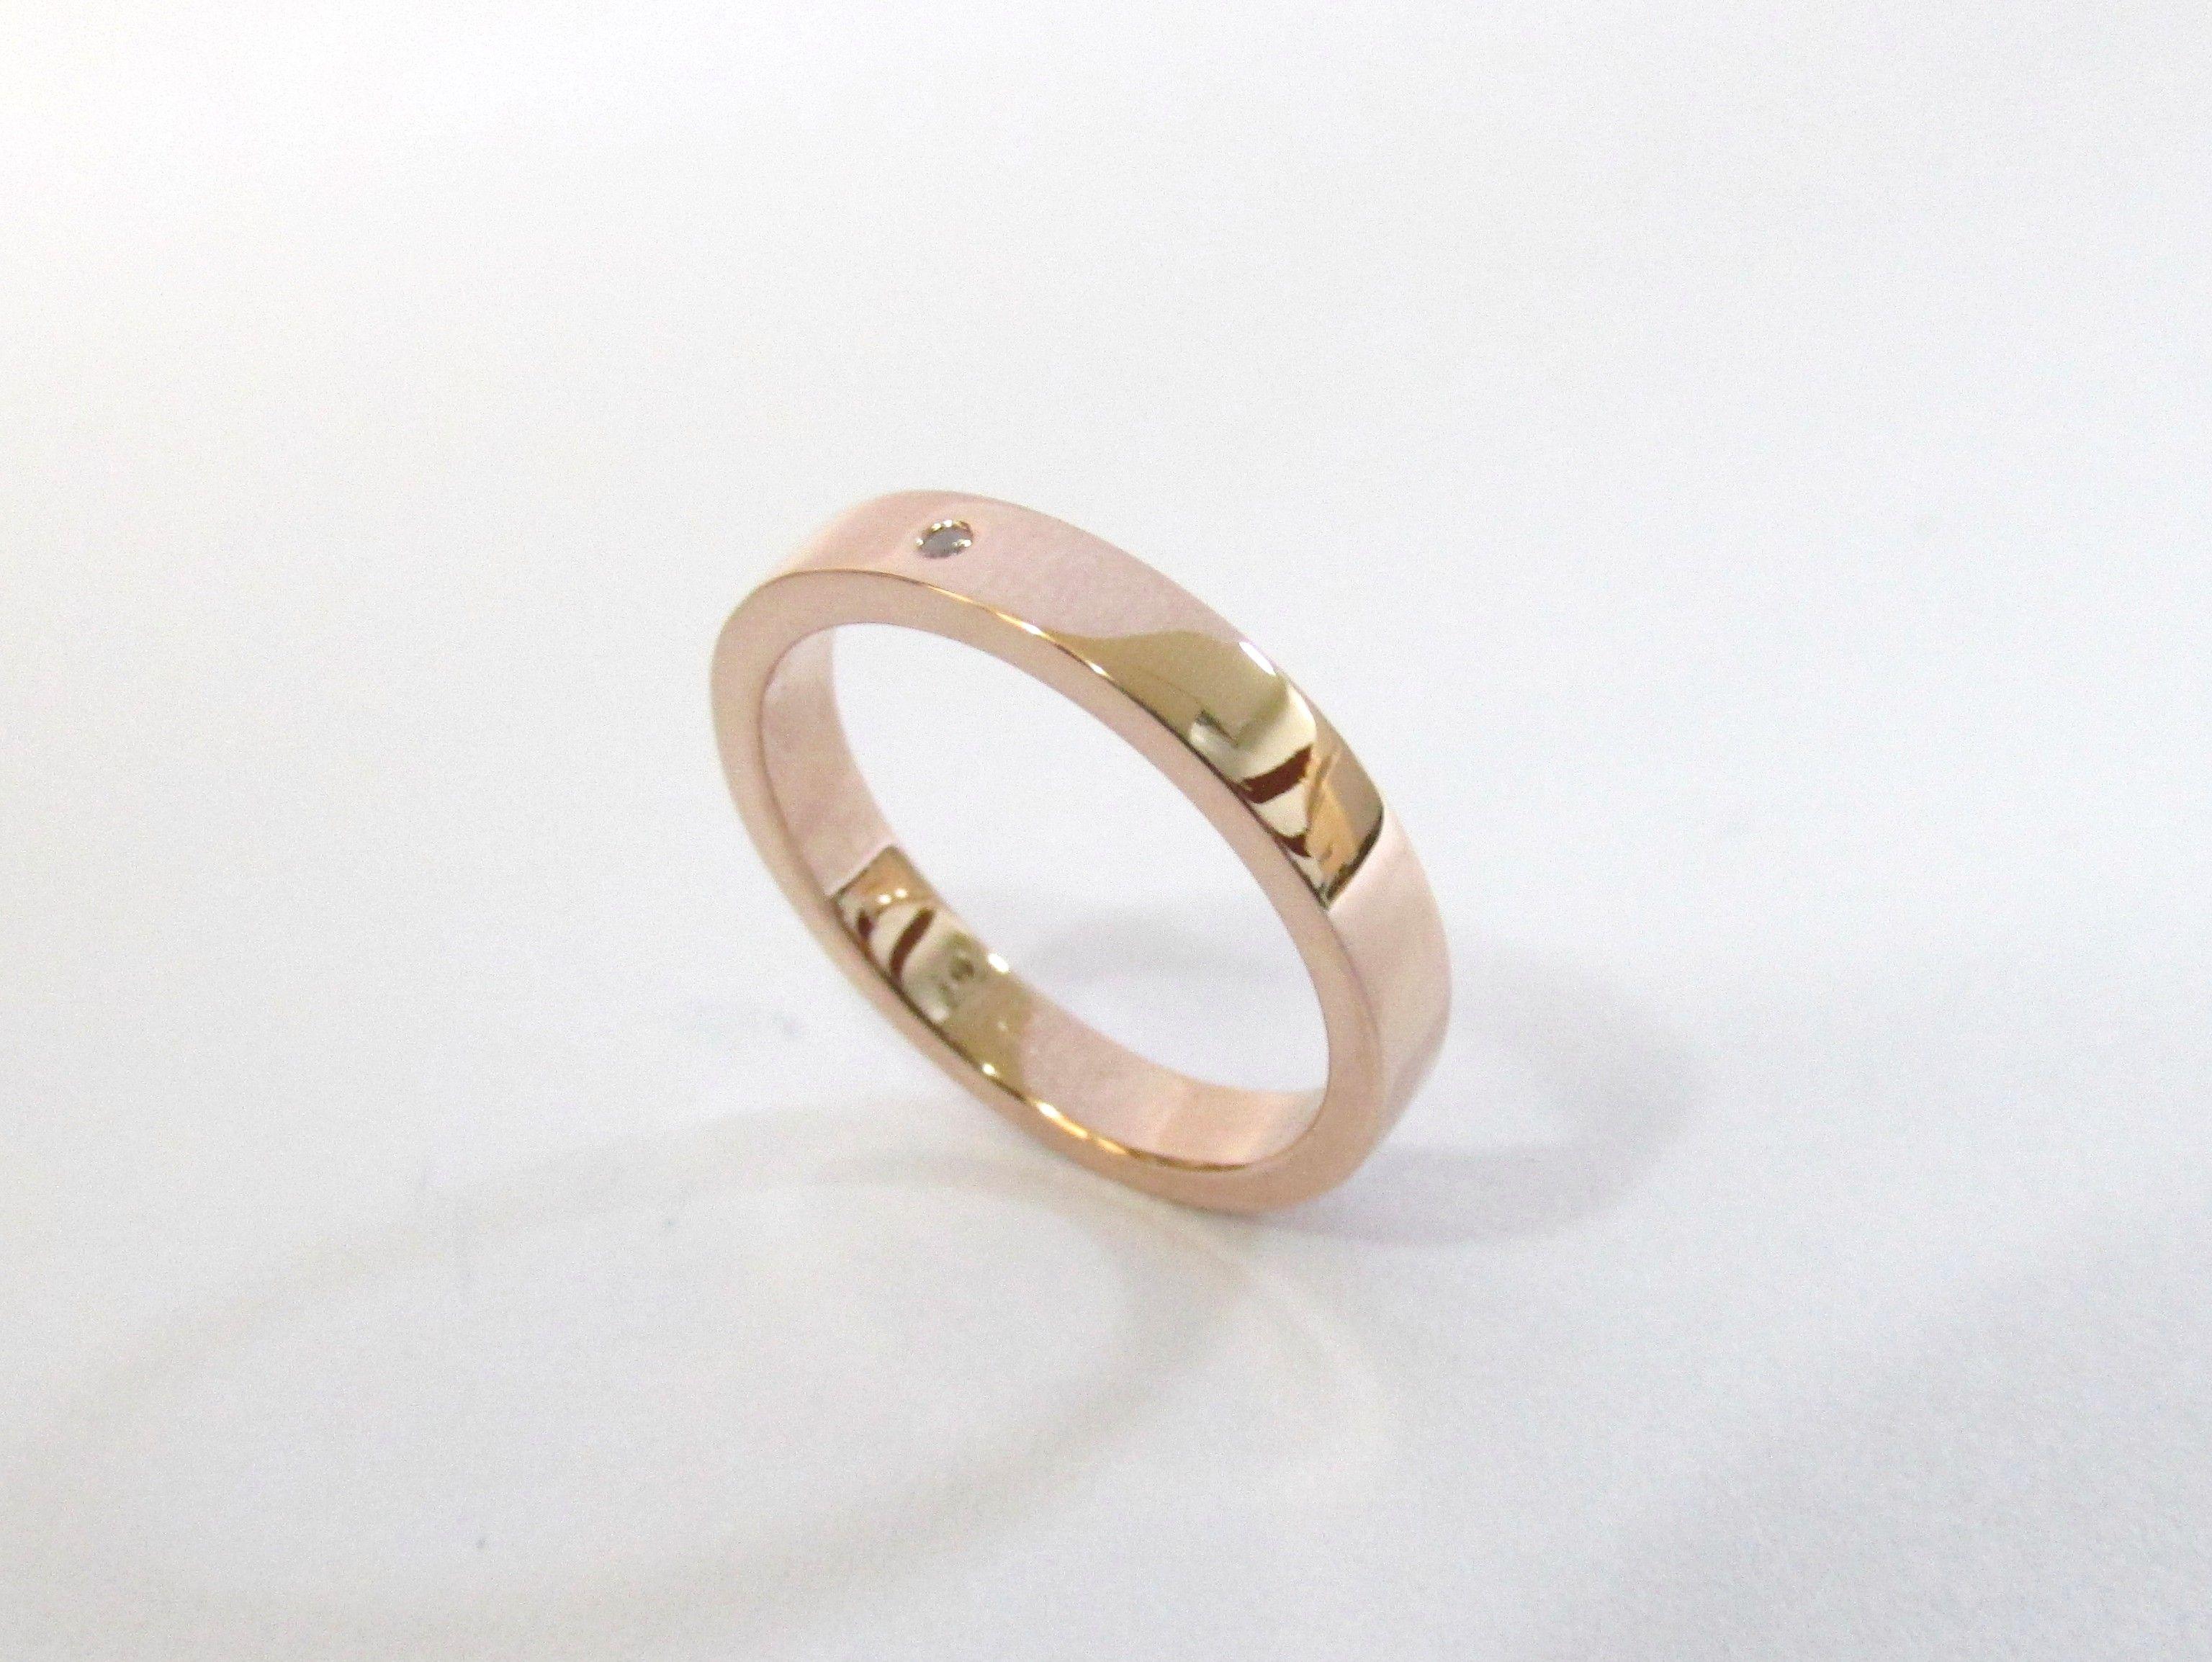 e3f502878152 Delicada argolla para matrimonio en oro rosa de 18k fabricada a mano R739   argollasdematrimonio